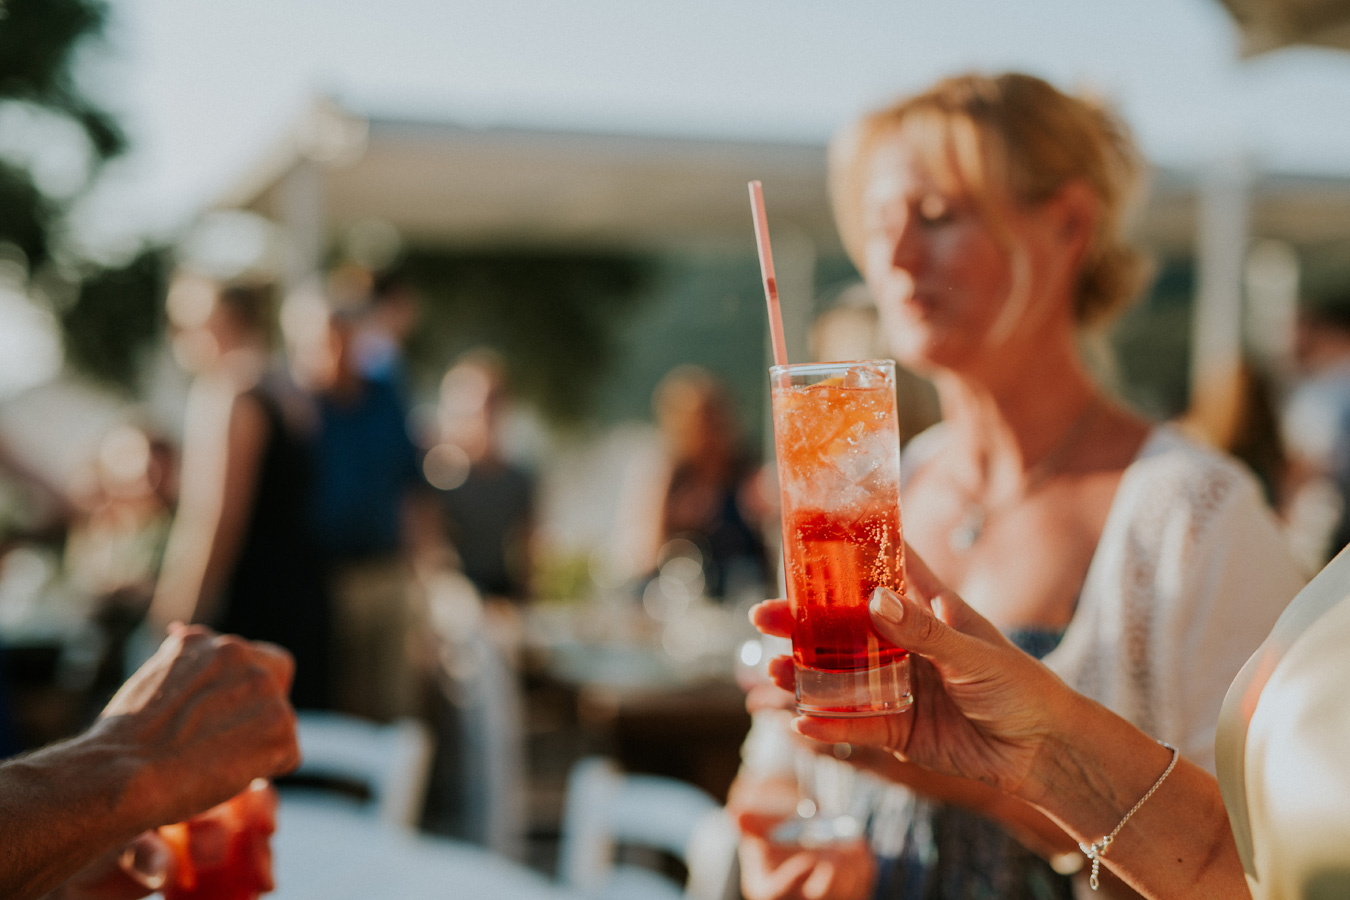 005-bryllupsfotograf-oslo-destinasjonsbryllup-fotograf-tone-tvedt.jpg